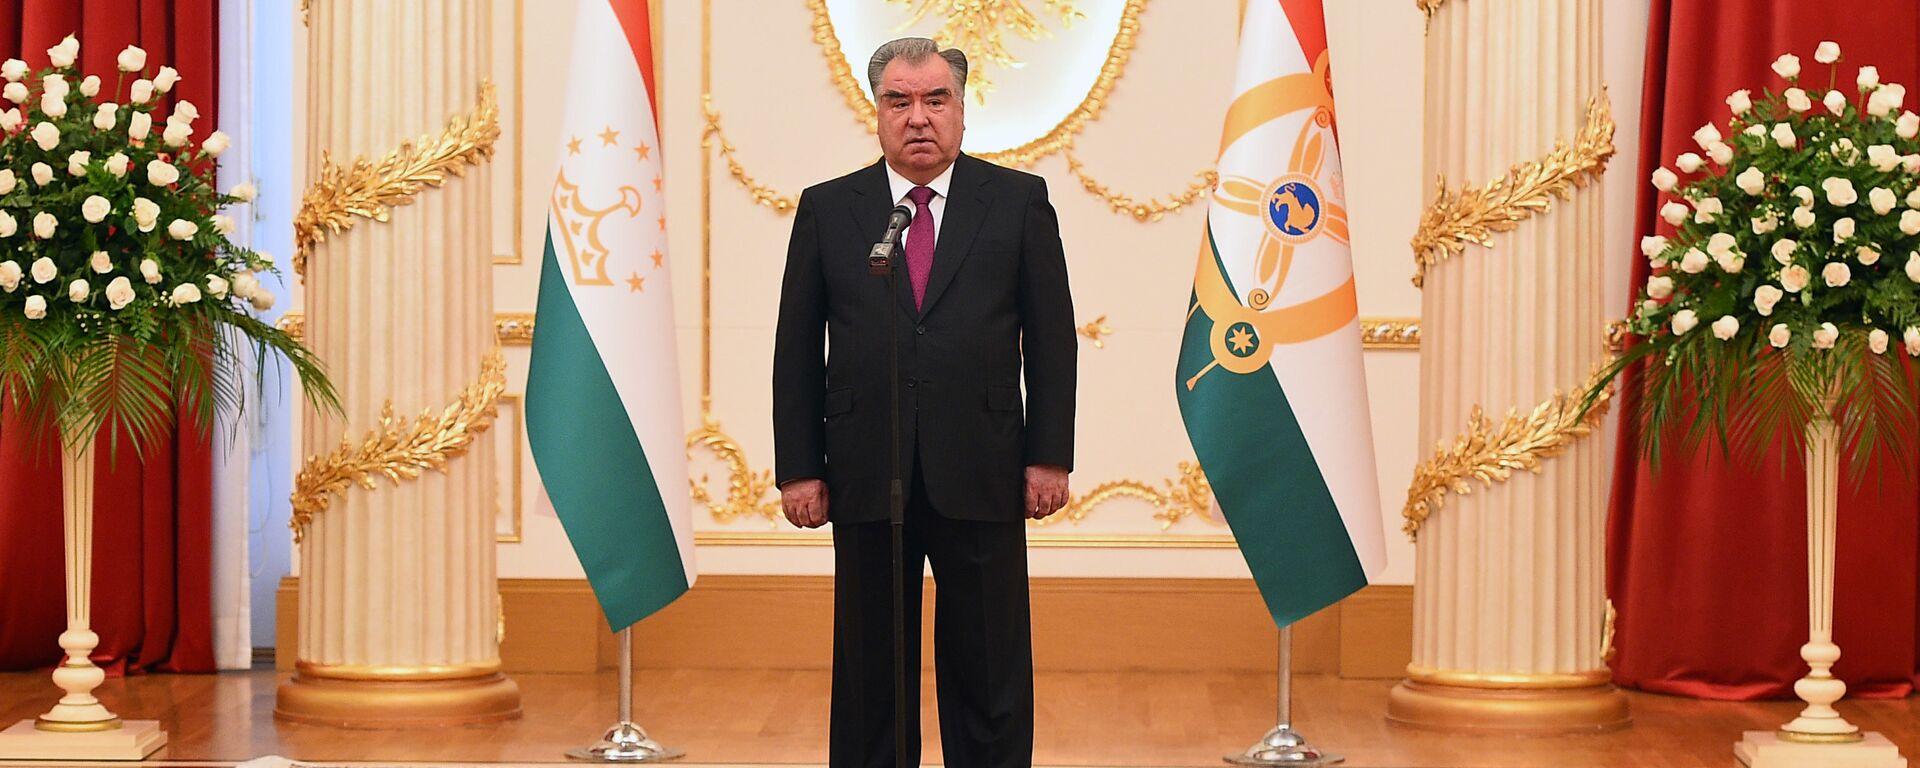 Президент Республики Таджикистан Эмомали Рахмон - Sputnik Таджикистан, 1920, 18.08.2021